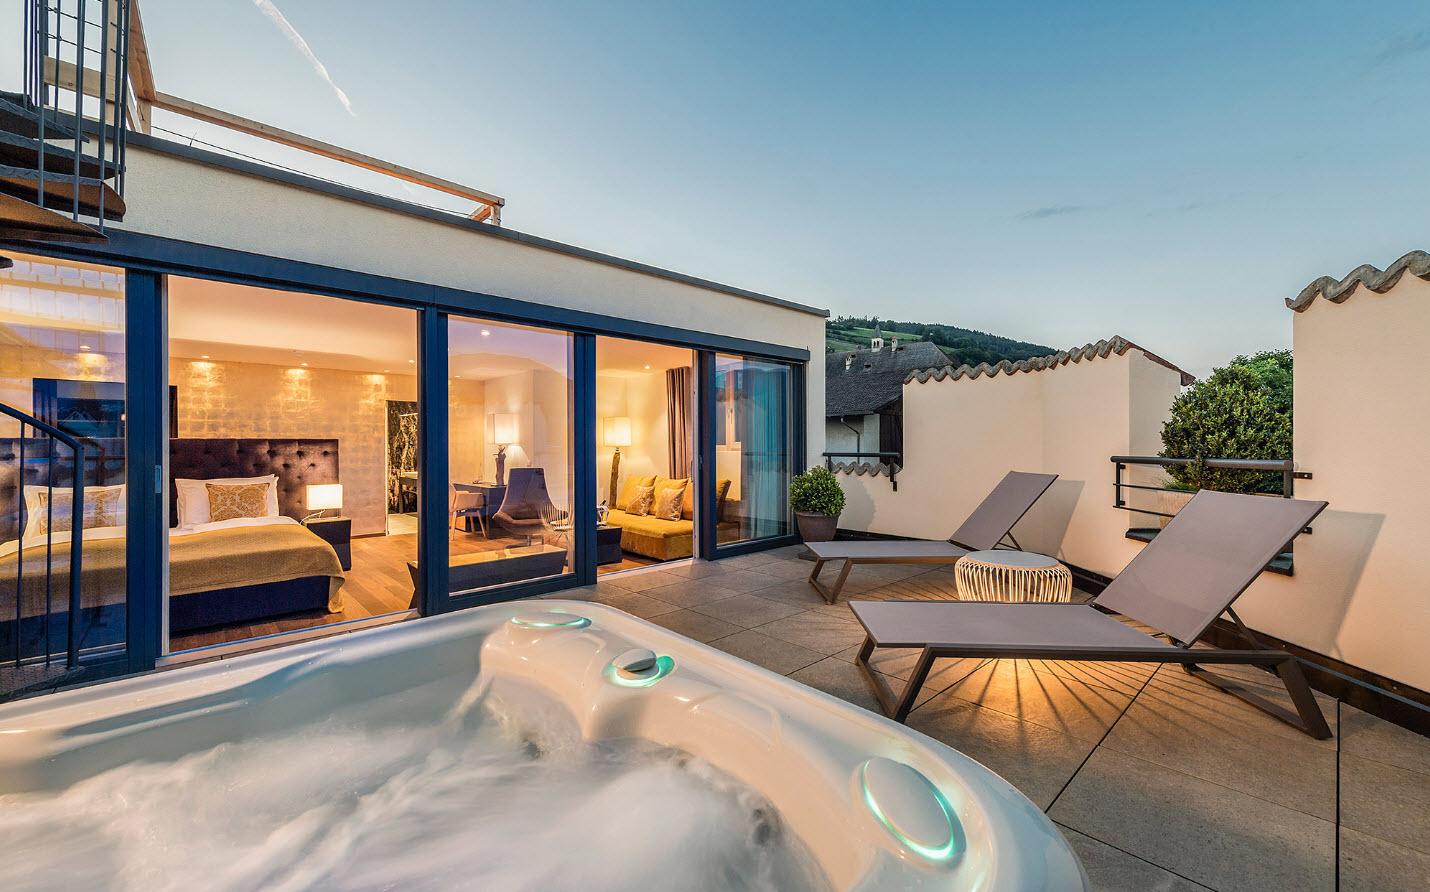 Suite Castanea - Dormir Dolomites - (c) Hannes Niederkofler - Hotel Taubers Unterwirt